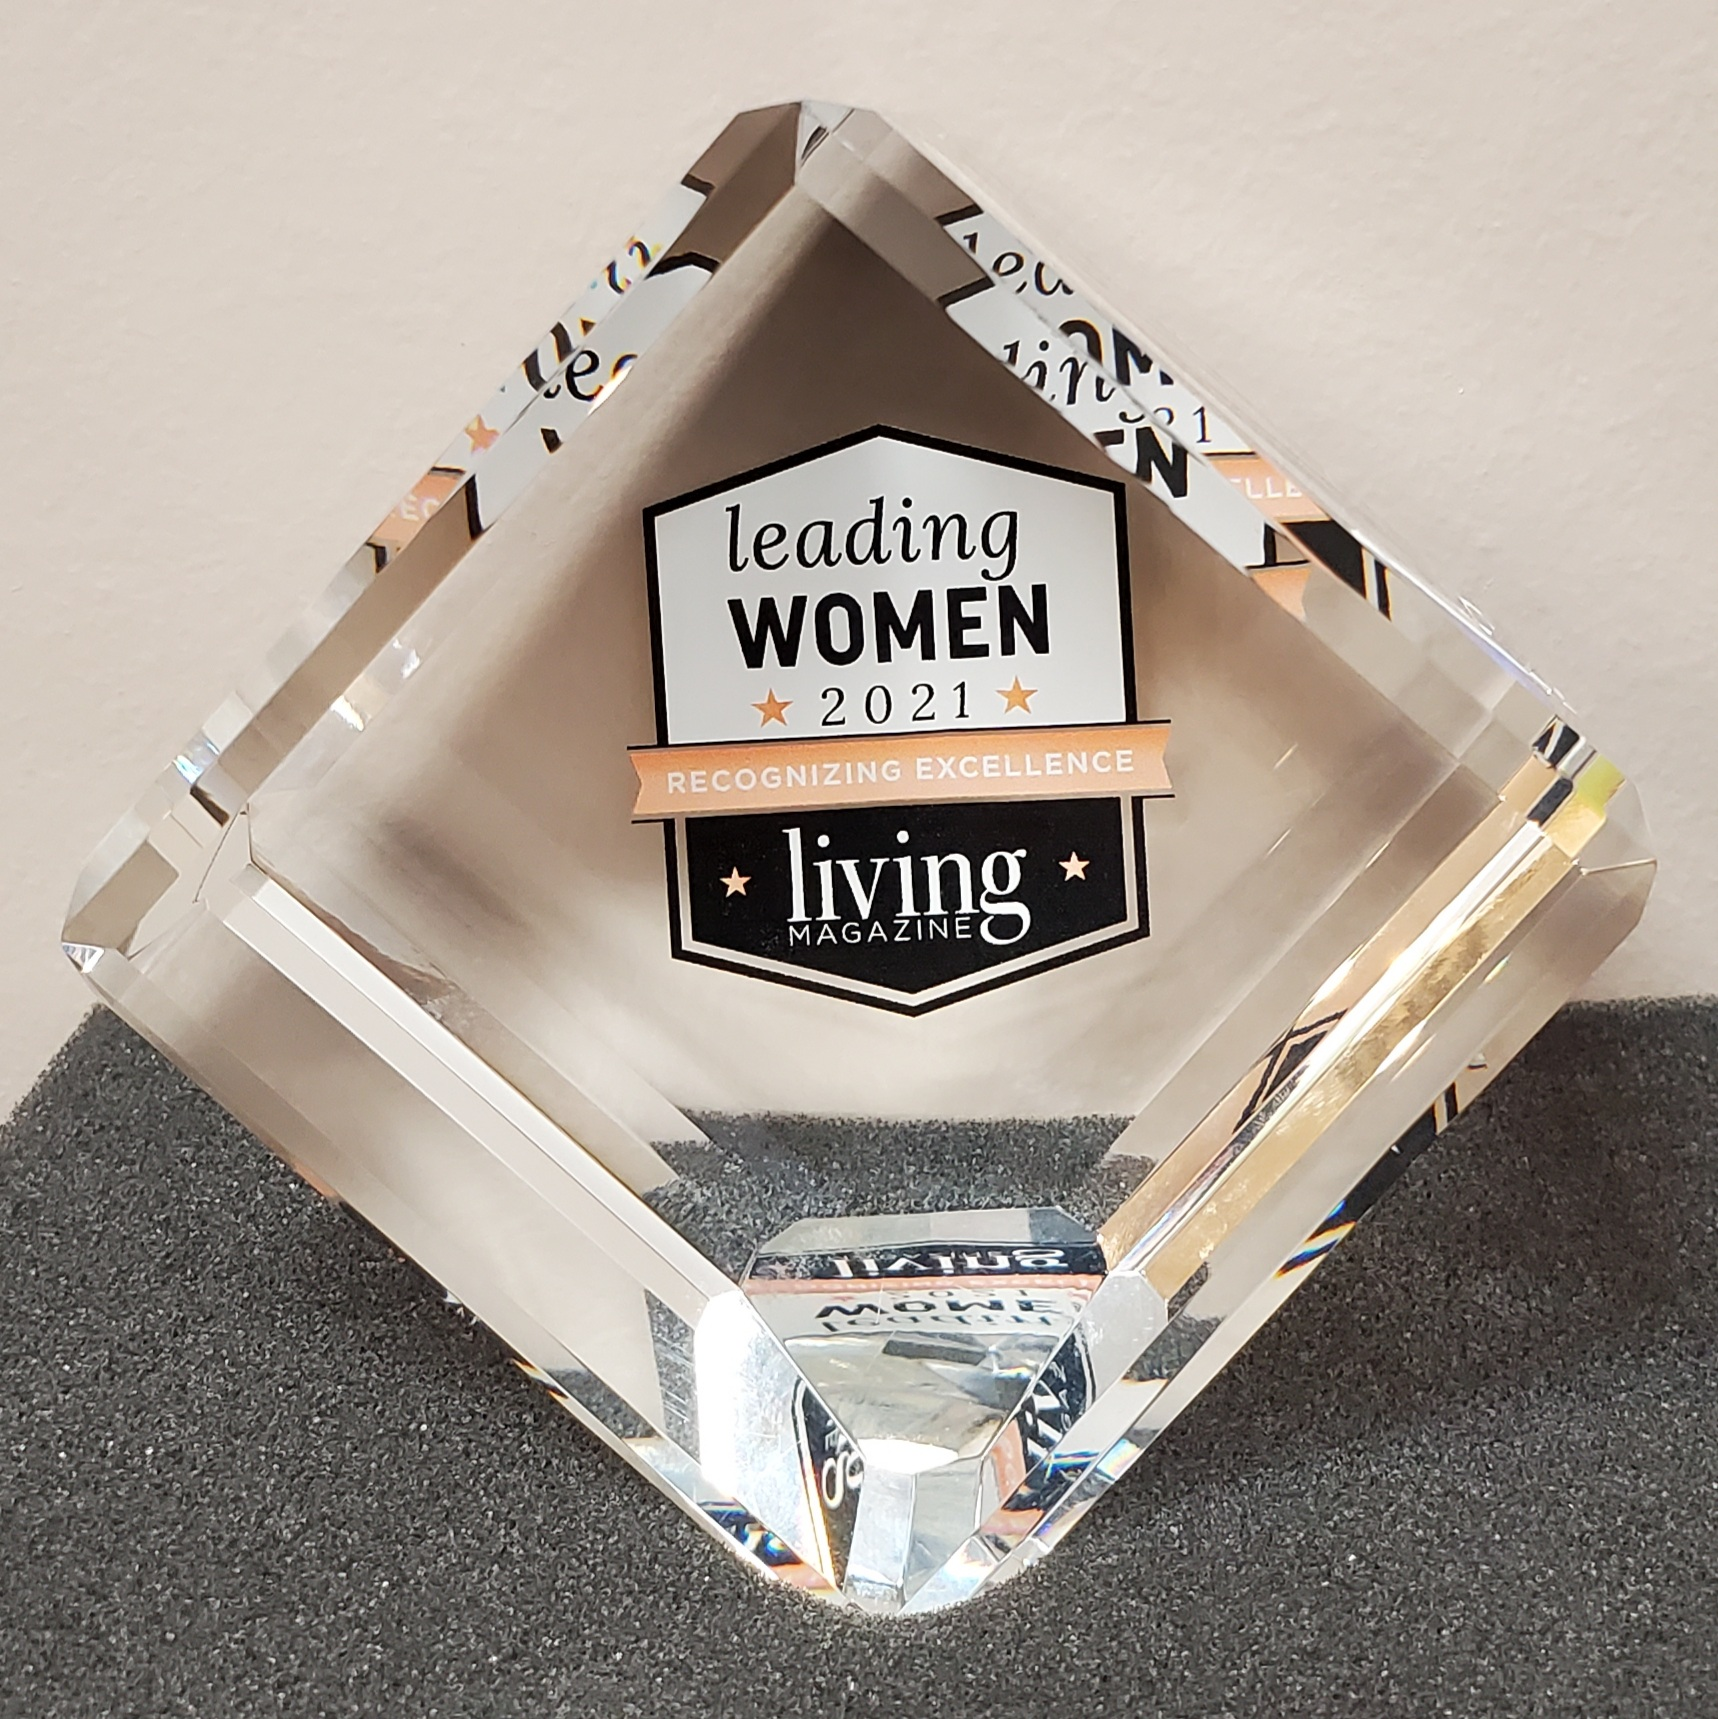 Leading Women Trophy Award from Living Magazine